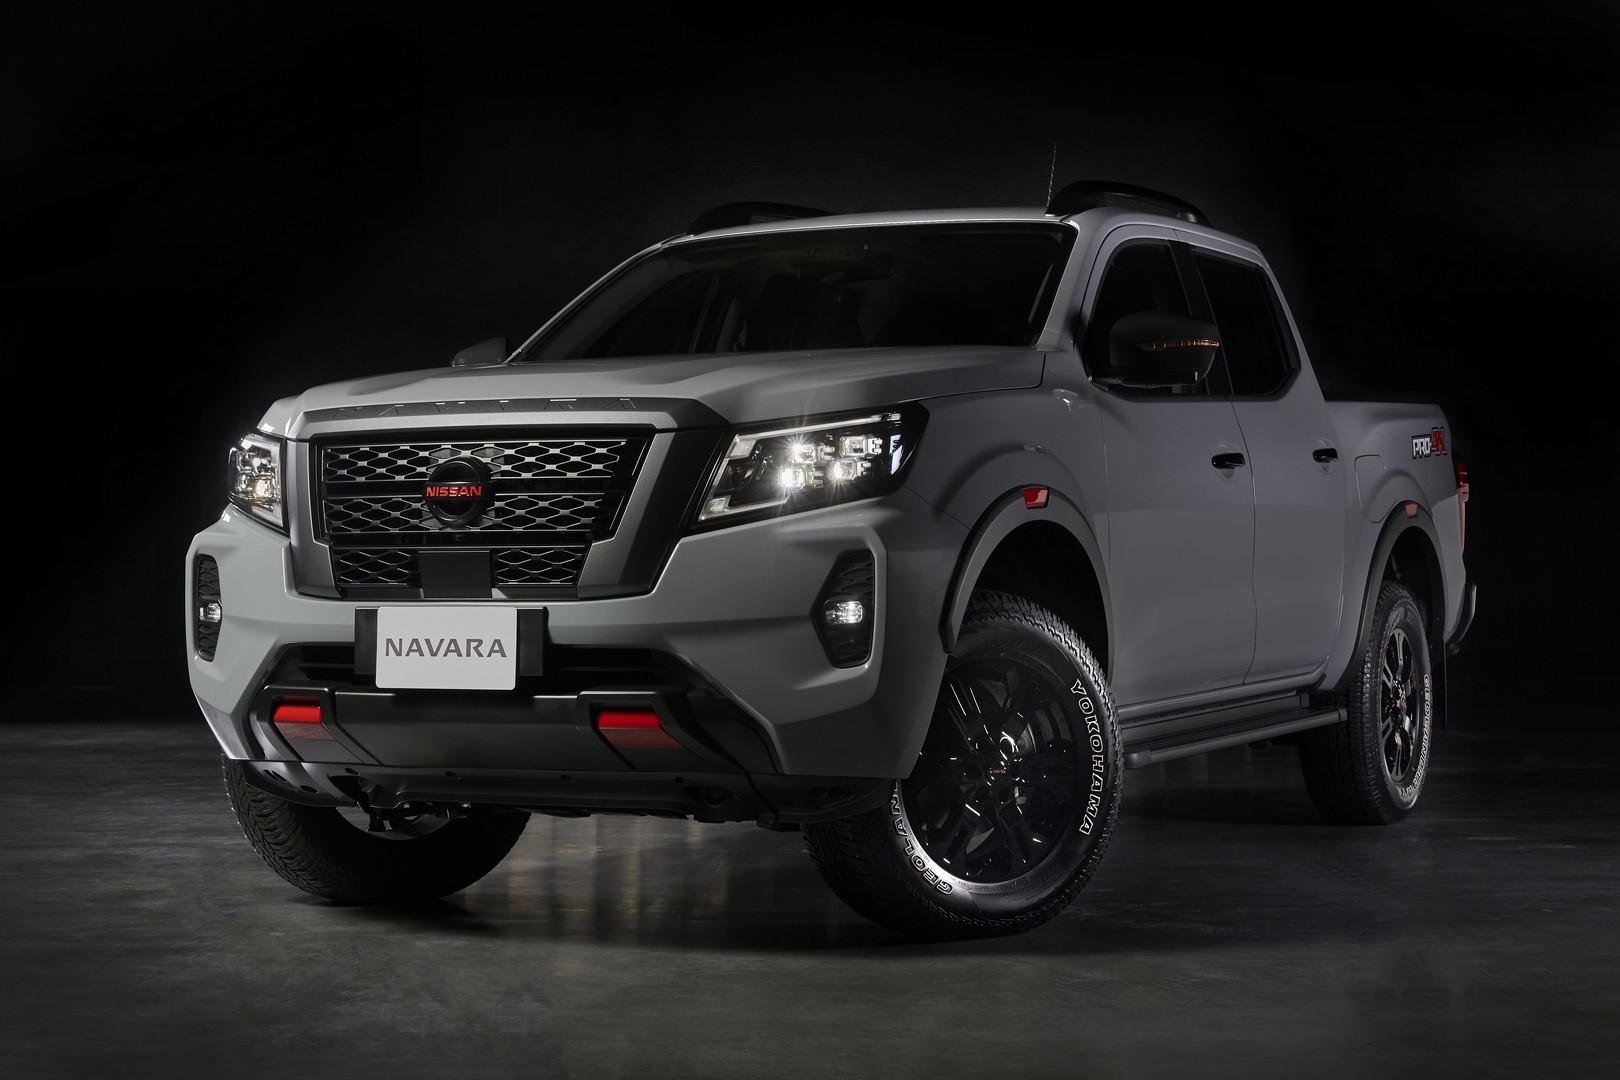 Nissan-Navara-2021-facelift-4